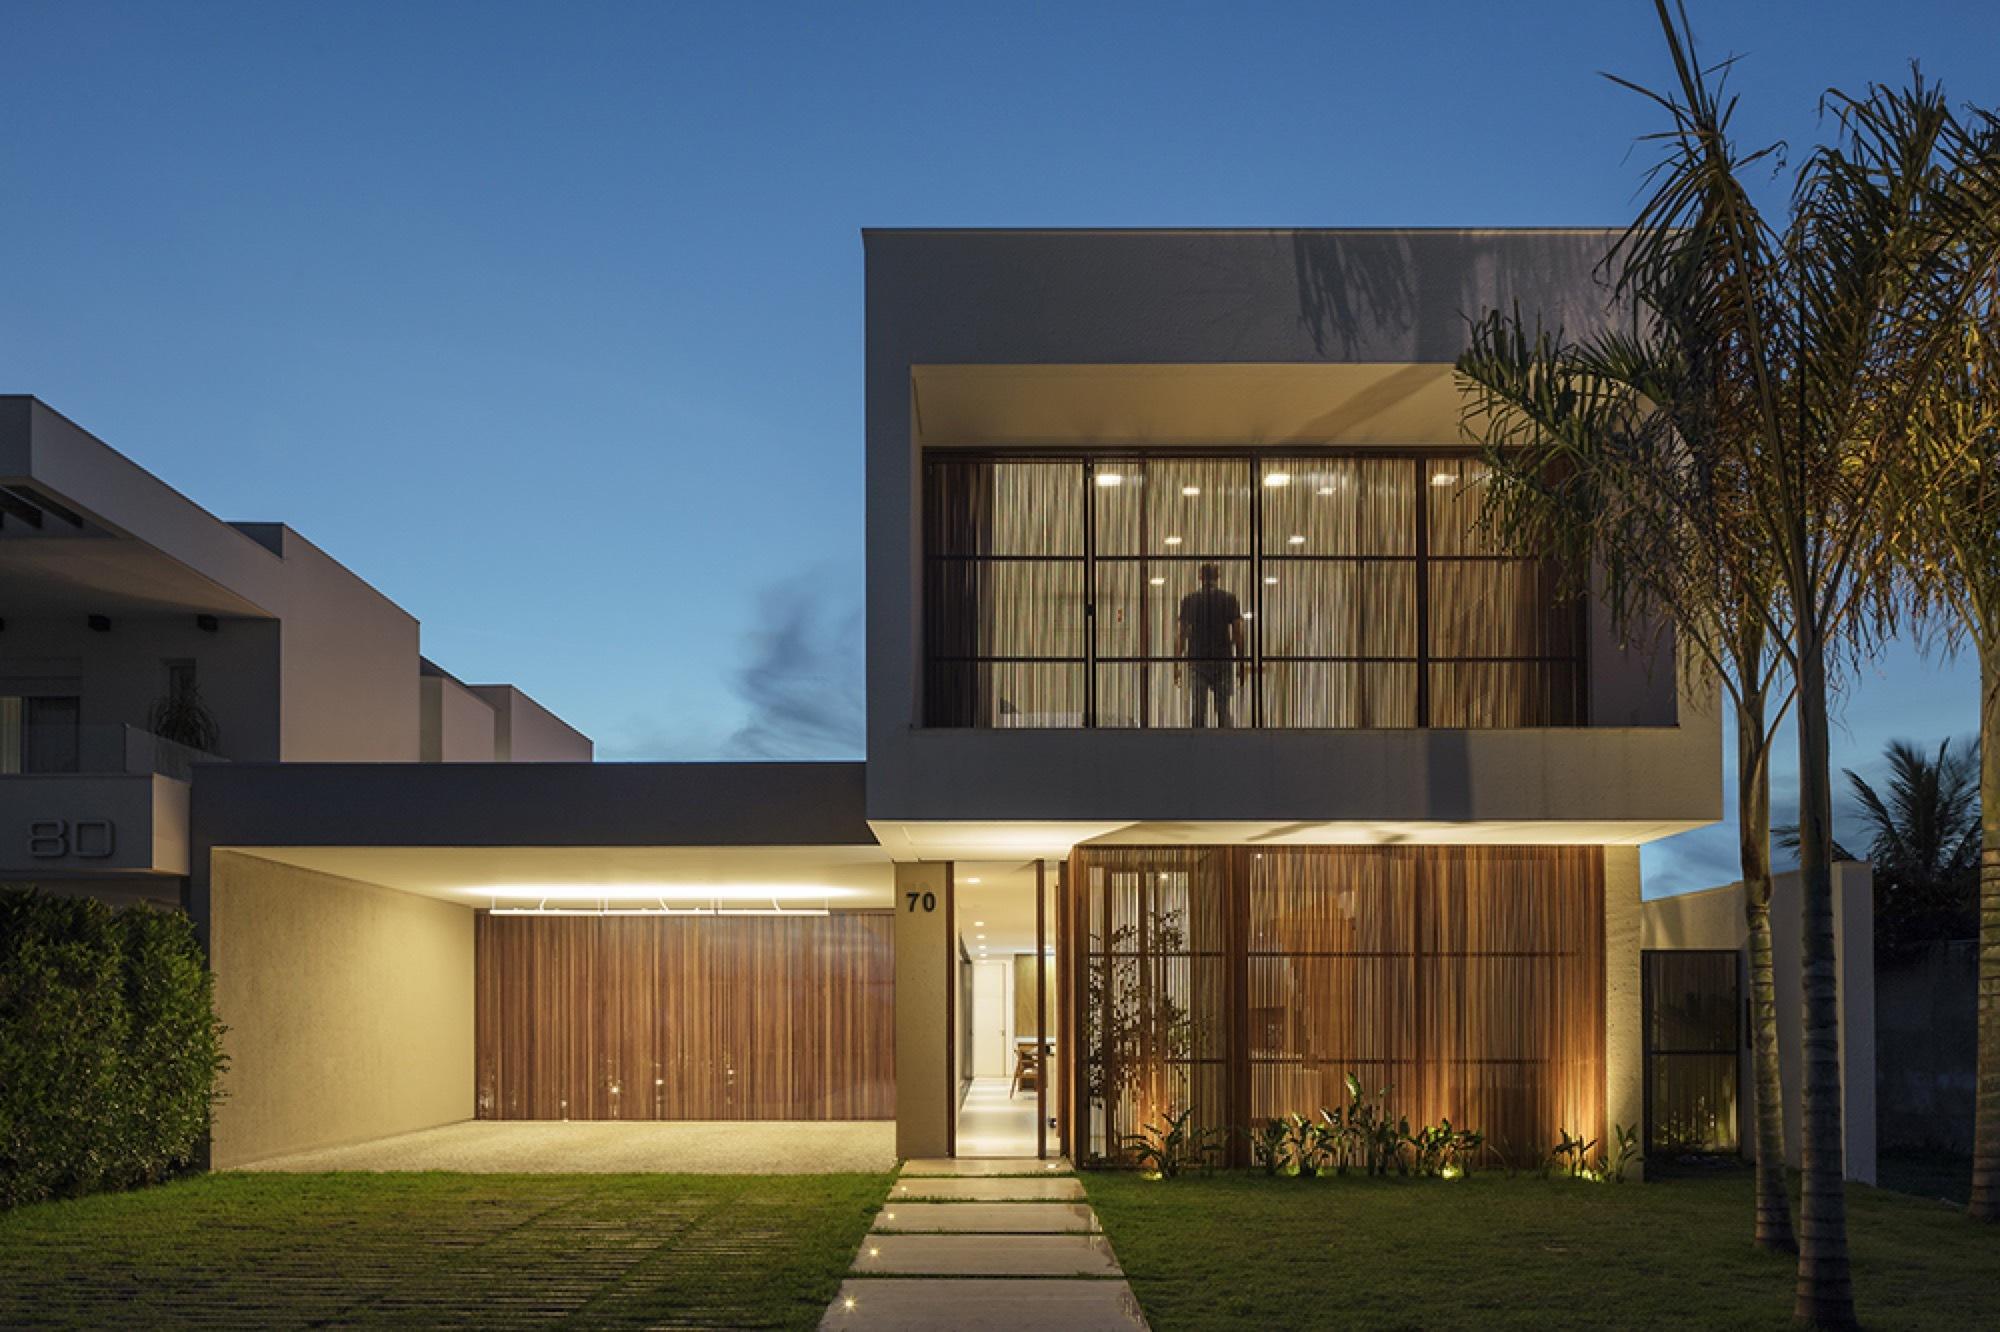 Galeria de casa olhos d gua aguirre arquitetura 1 Modelo de casa l